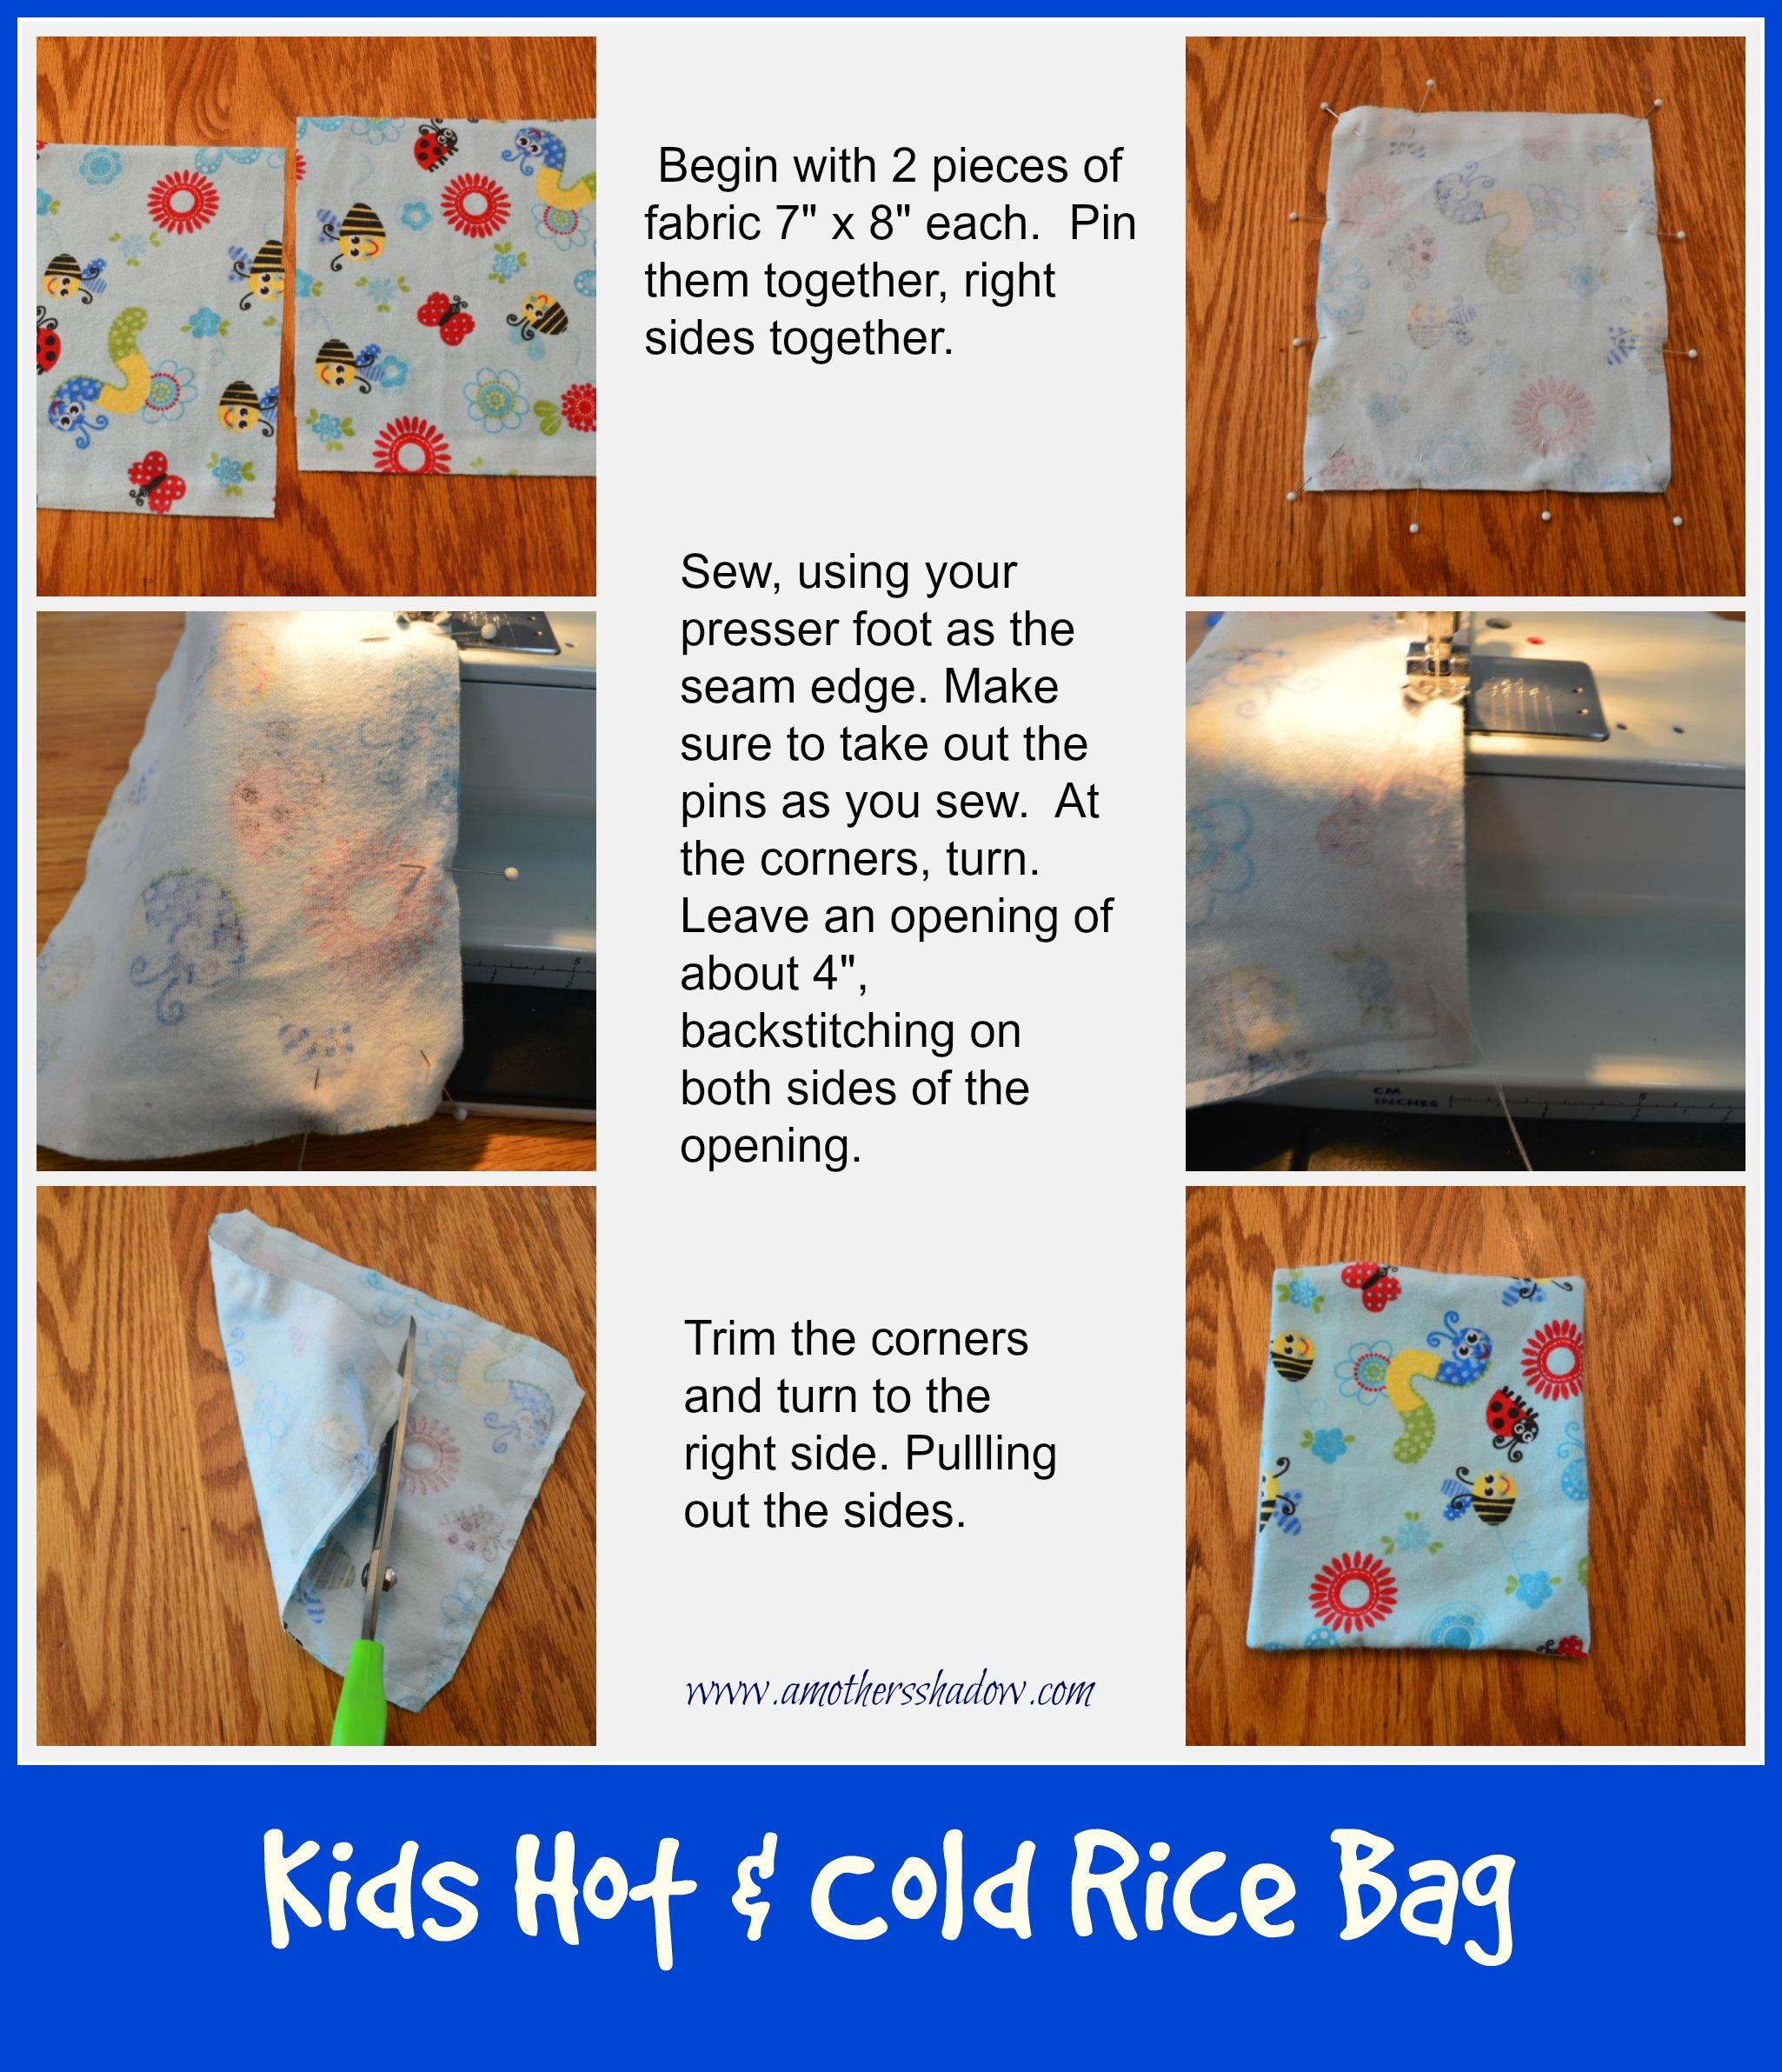 Kids Hot & Cold Rice Bag 1